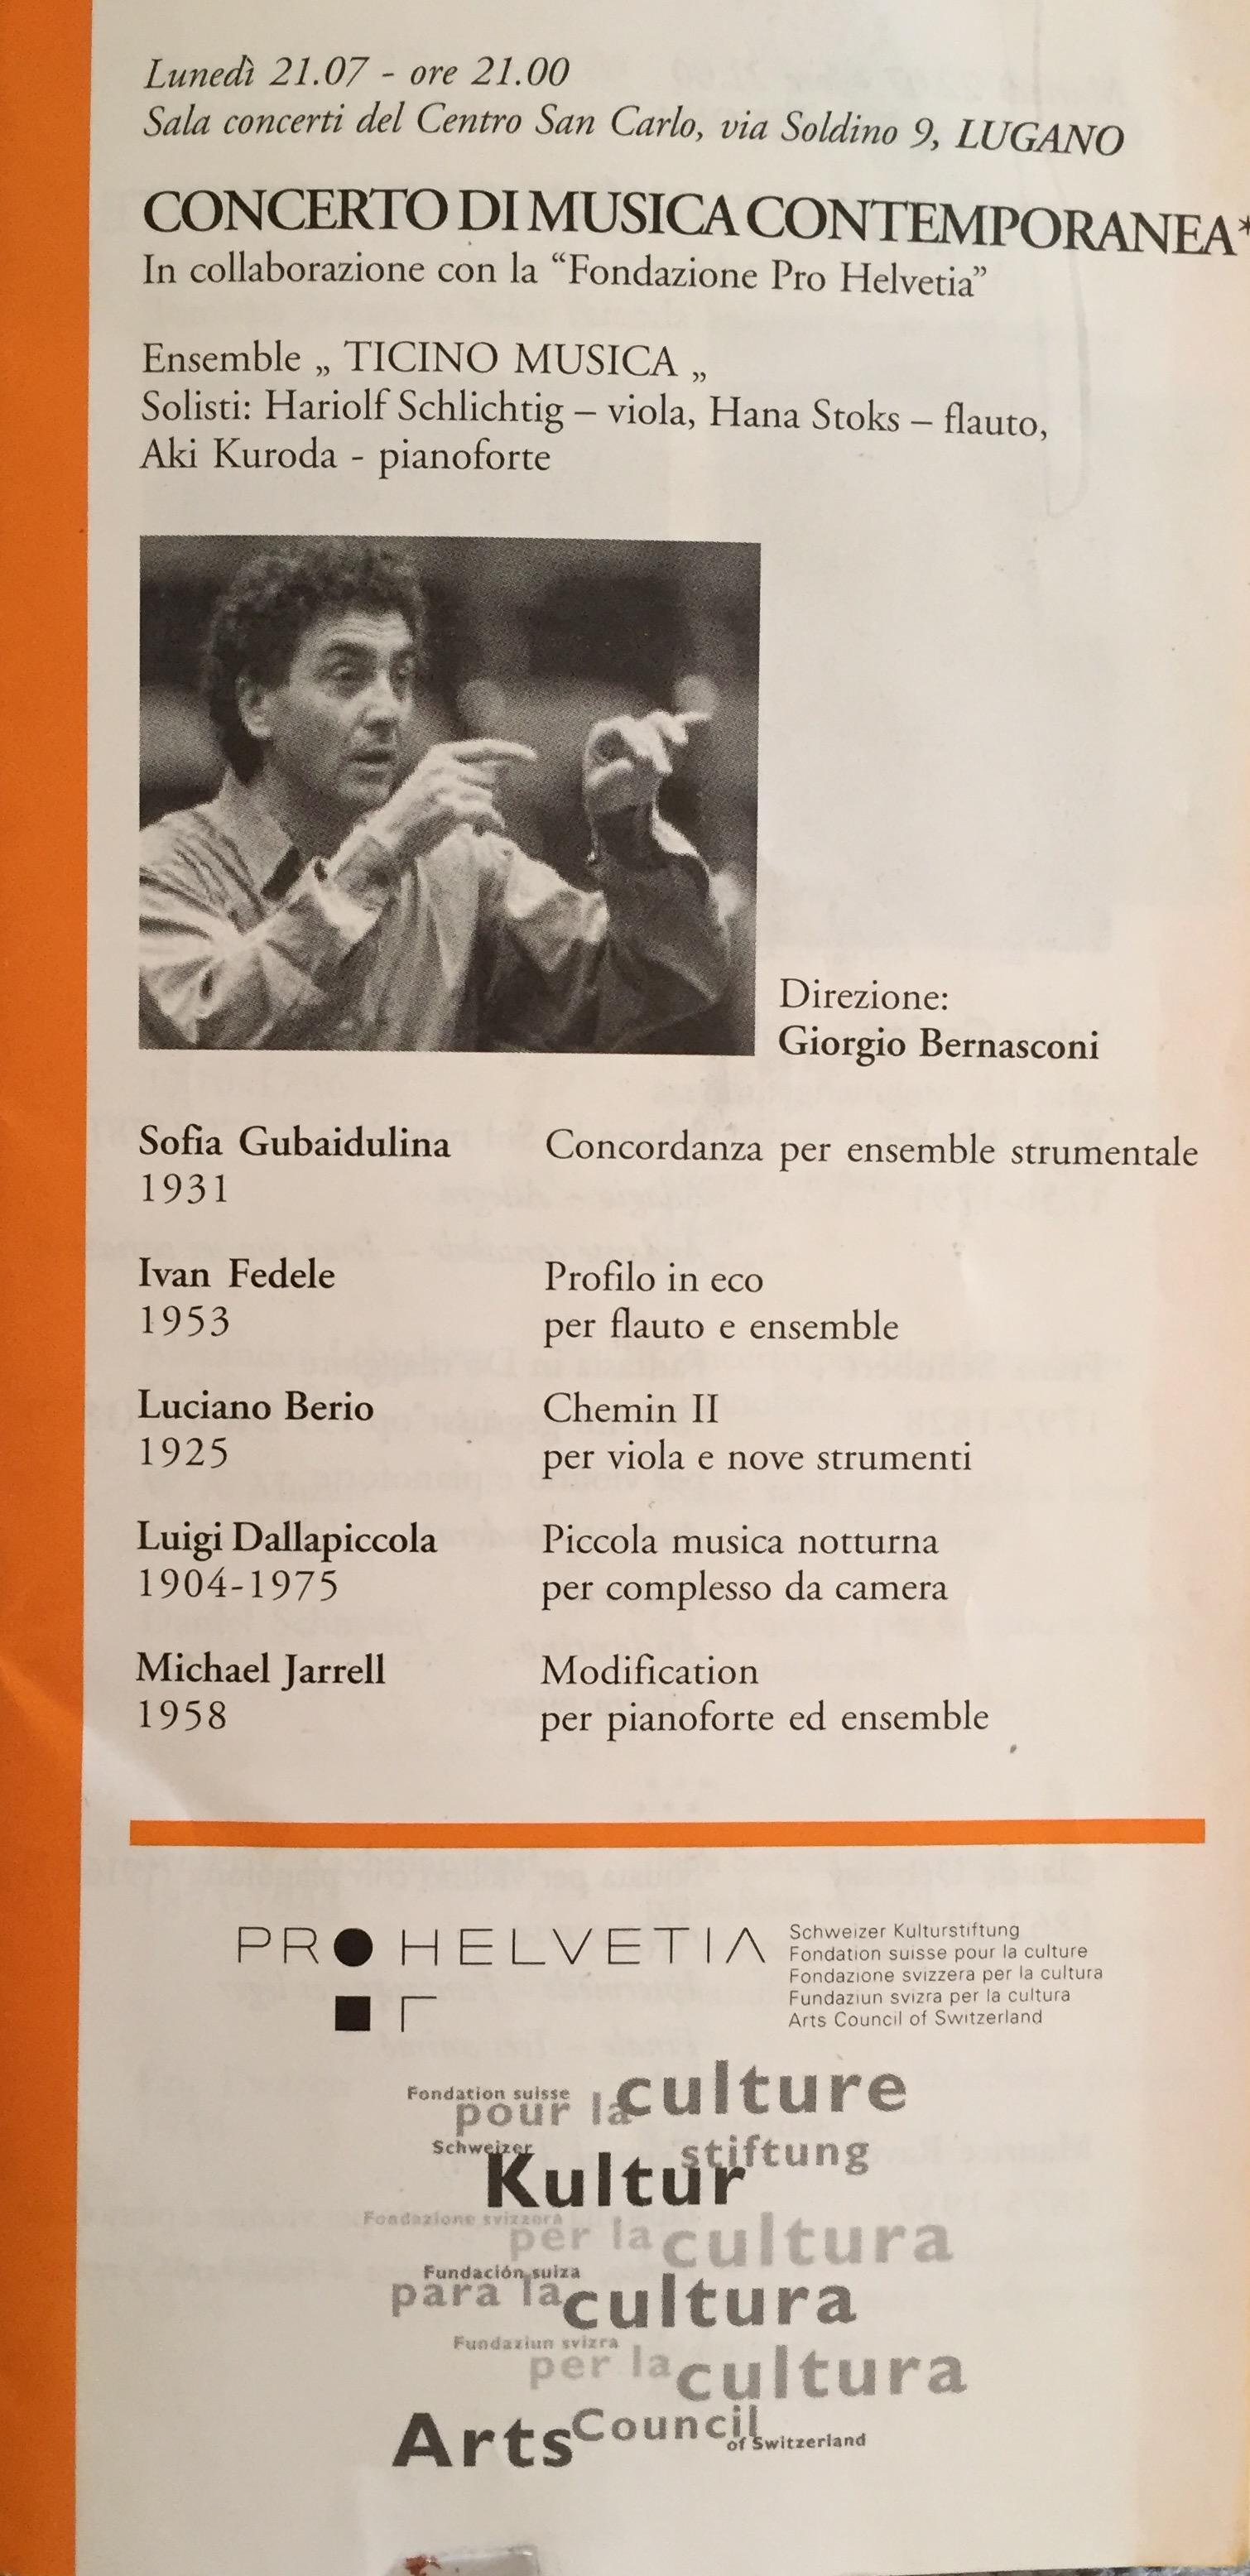 Ticino Musica Switzerland Anna Stokes Flute Soloist